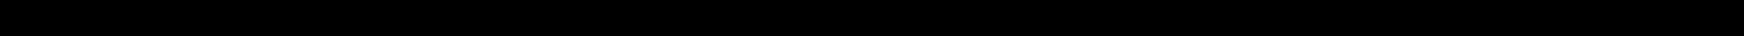 FarnhamText-RegularItalic.otf